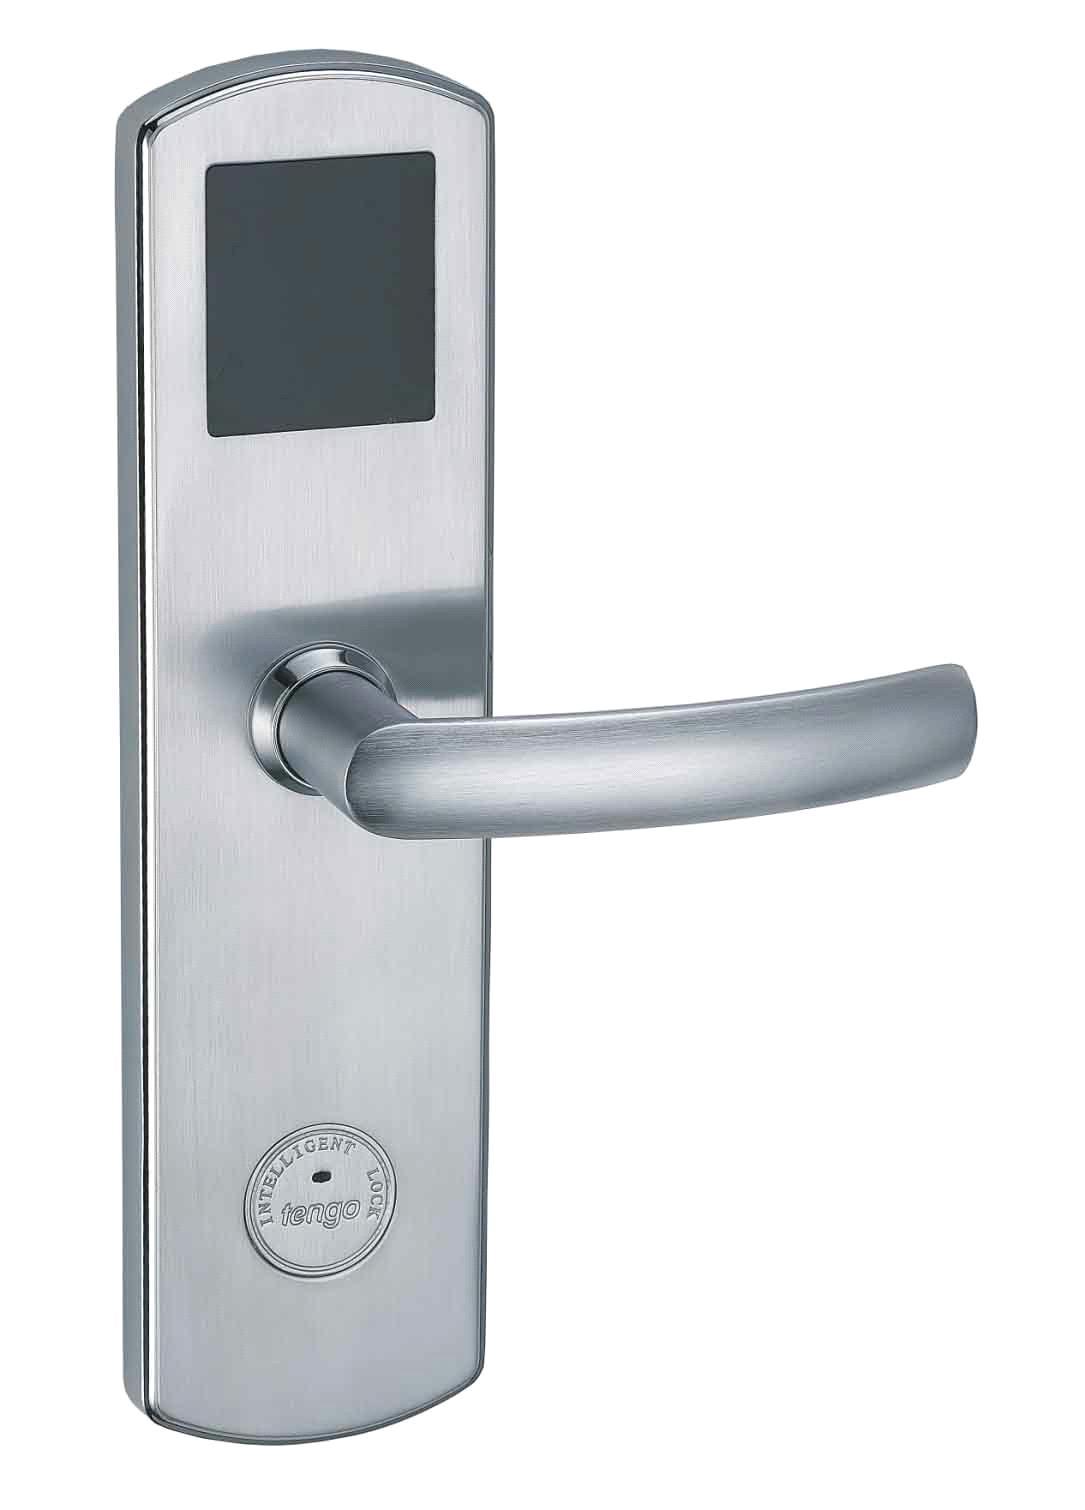 Aluminum door aluminum door lock suppliers Exterior aluminum doors manufacturers